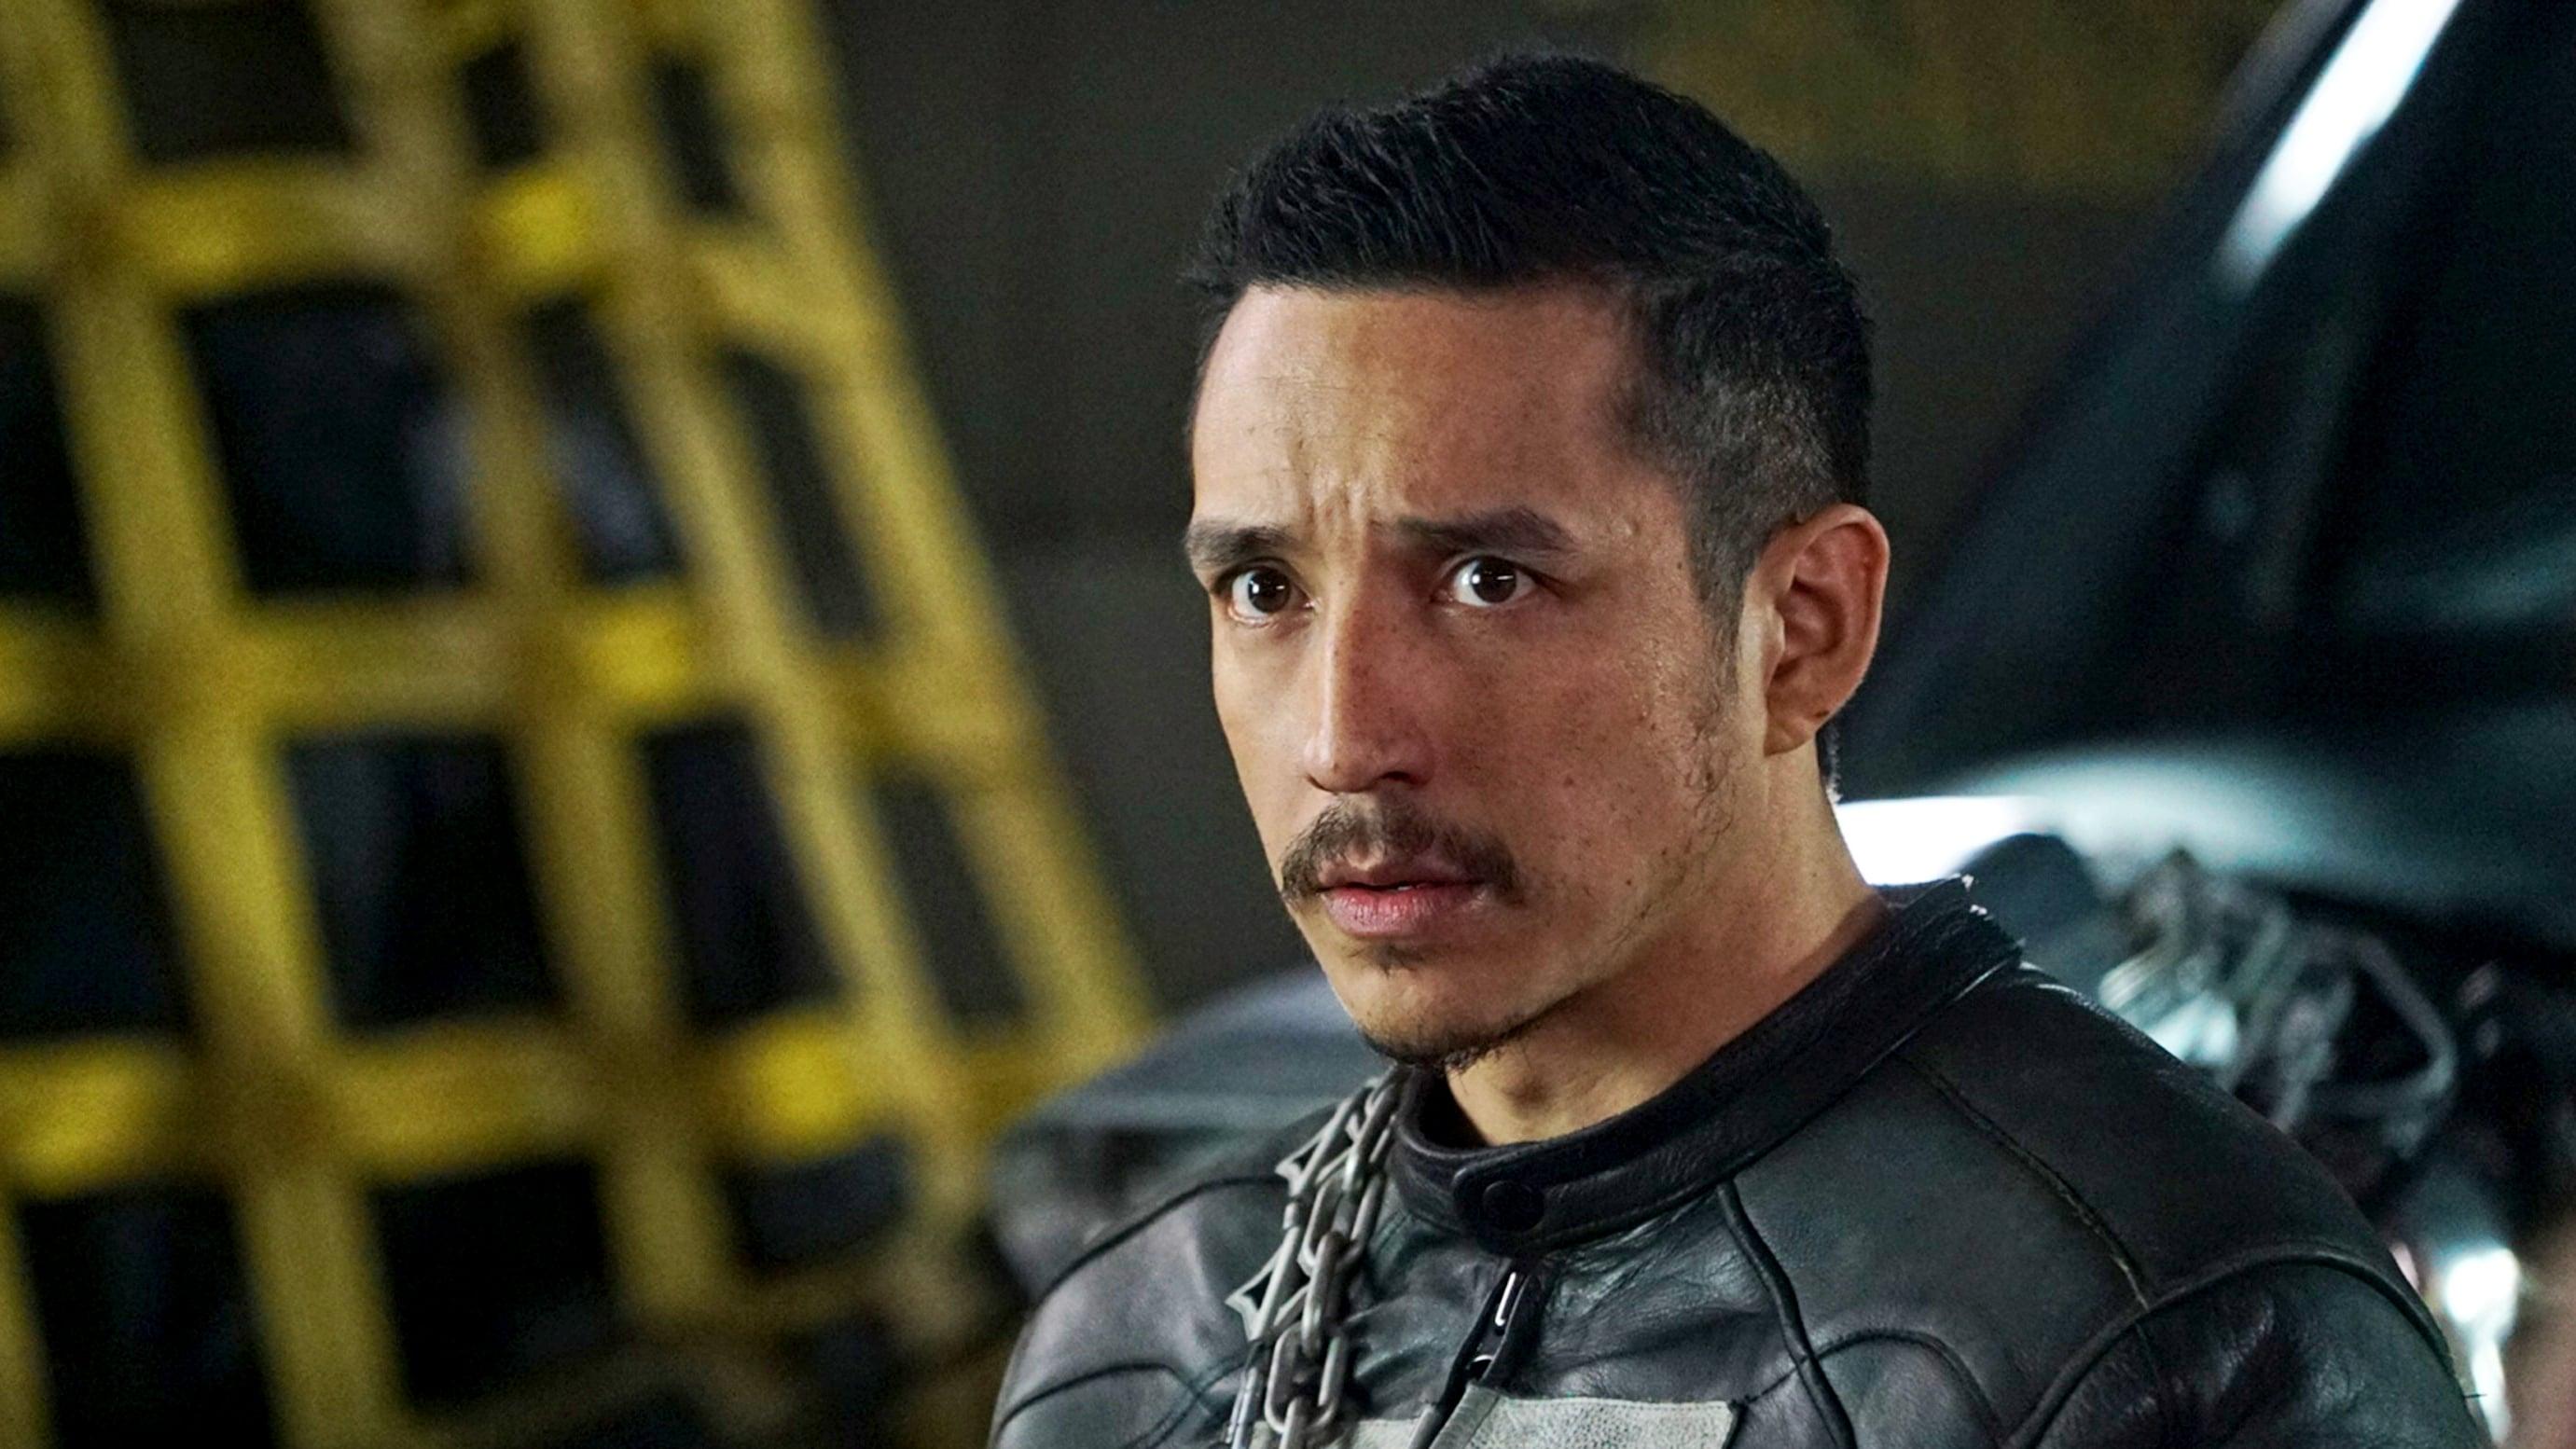 Marvel's Agents of S.H.I.E.L.D. Season 4 :Episode 22  World's End